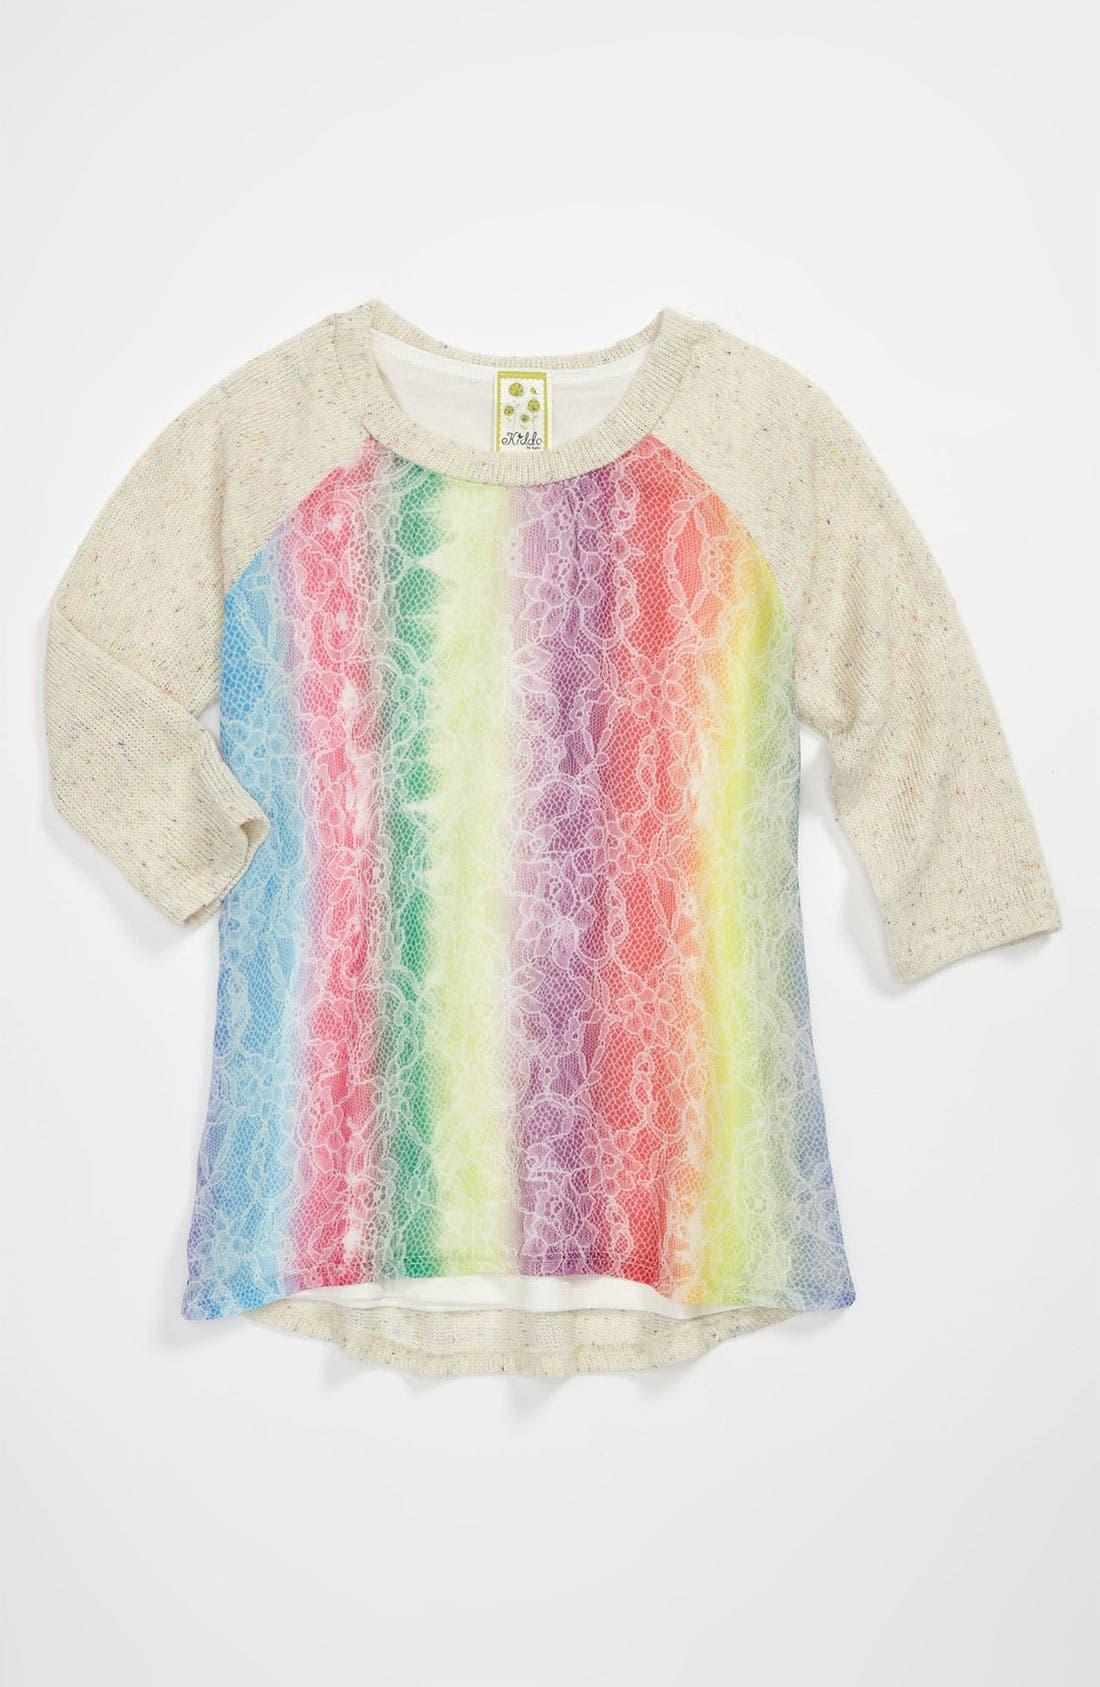 Main Image - Kiddo 'Rainbow Lace' Sweater (Big Girls)